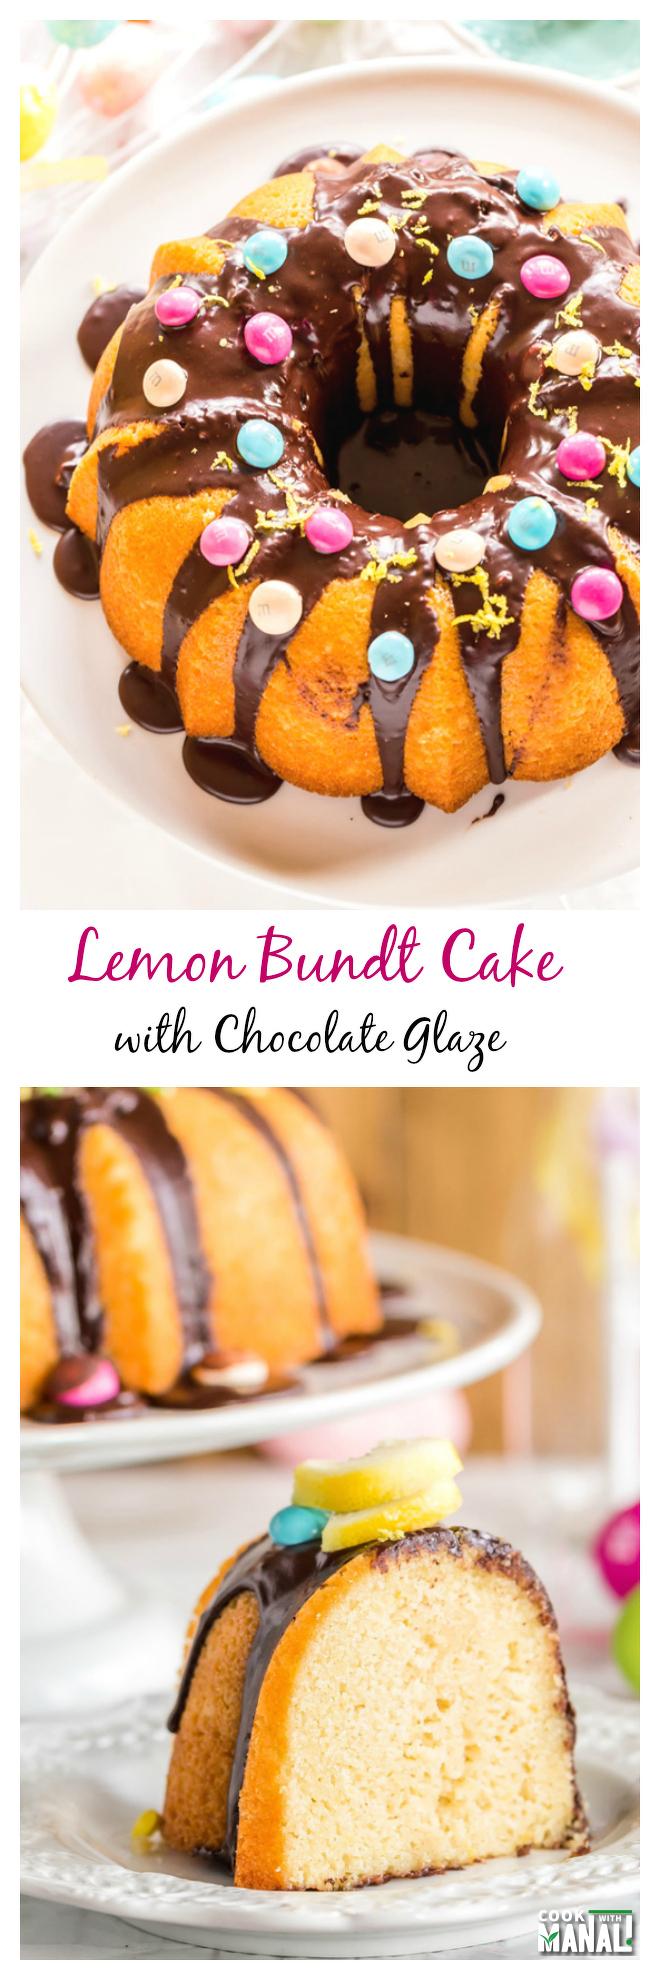 Lemon Bundt Cake with Chocolate Glaze Collage